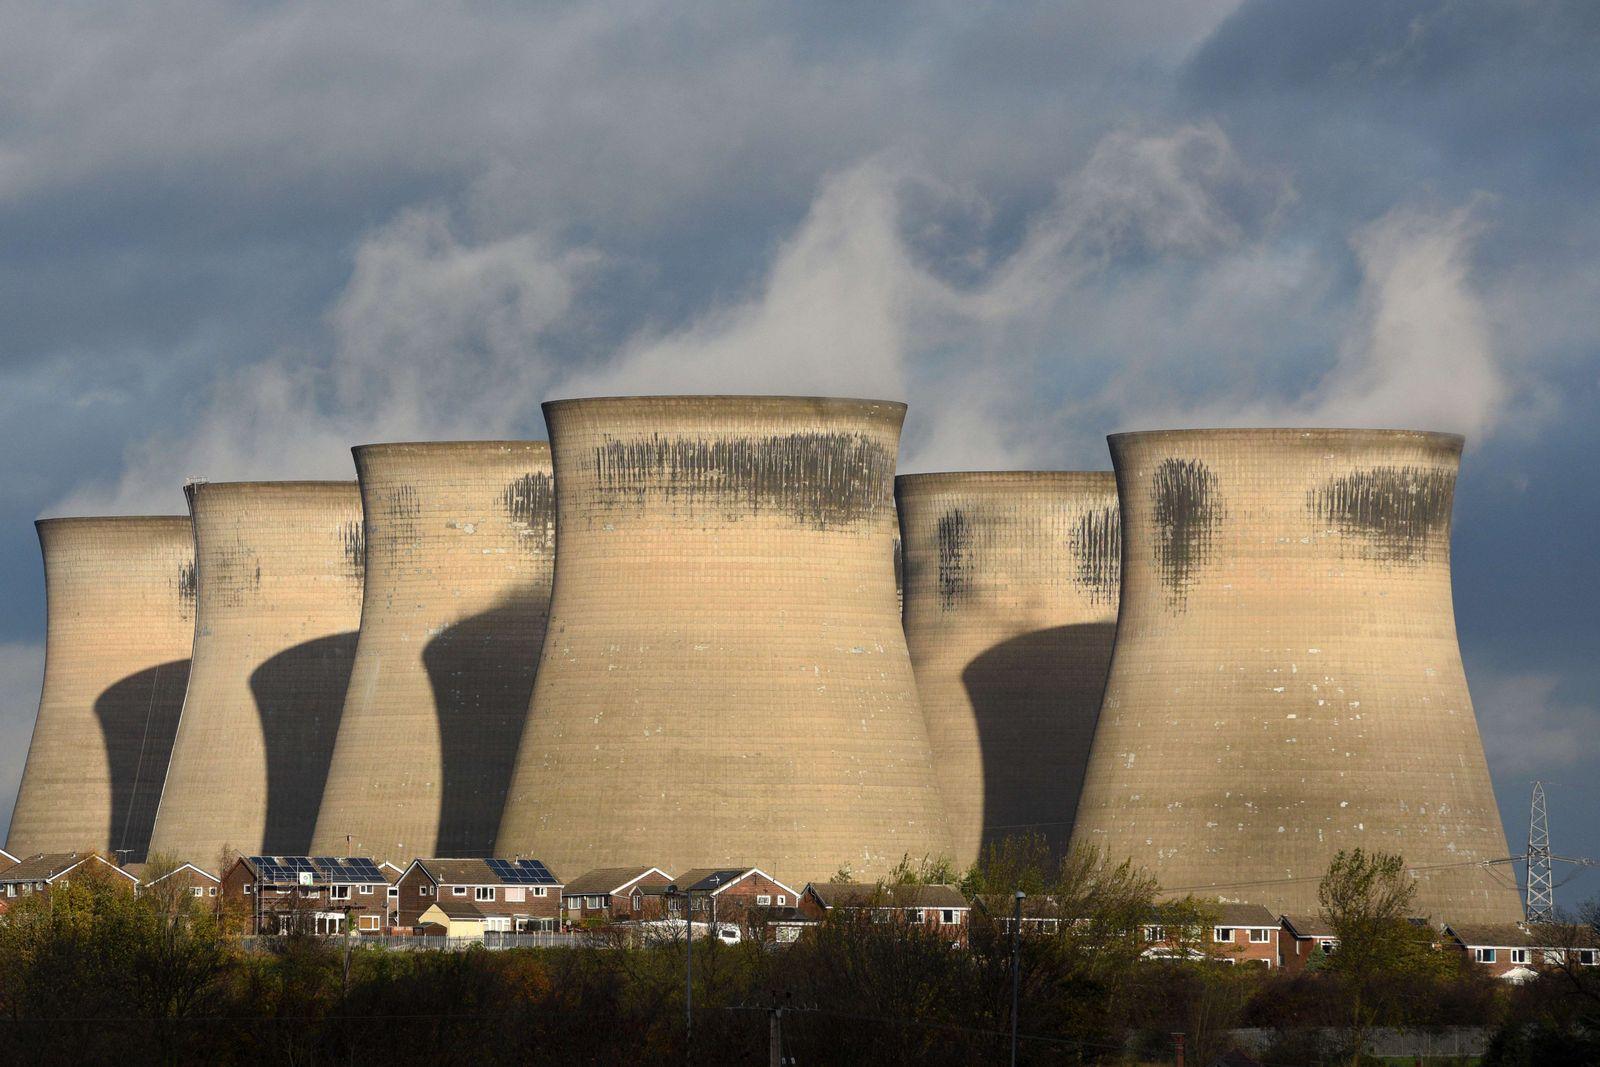 BRITAIN-ENERGY-COAL-GAS-ENVIRONMENT-FILES